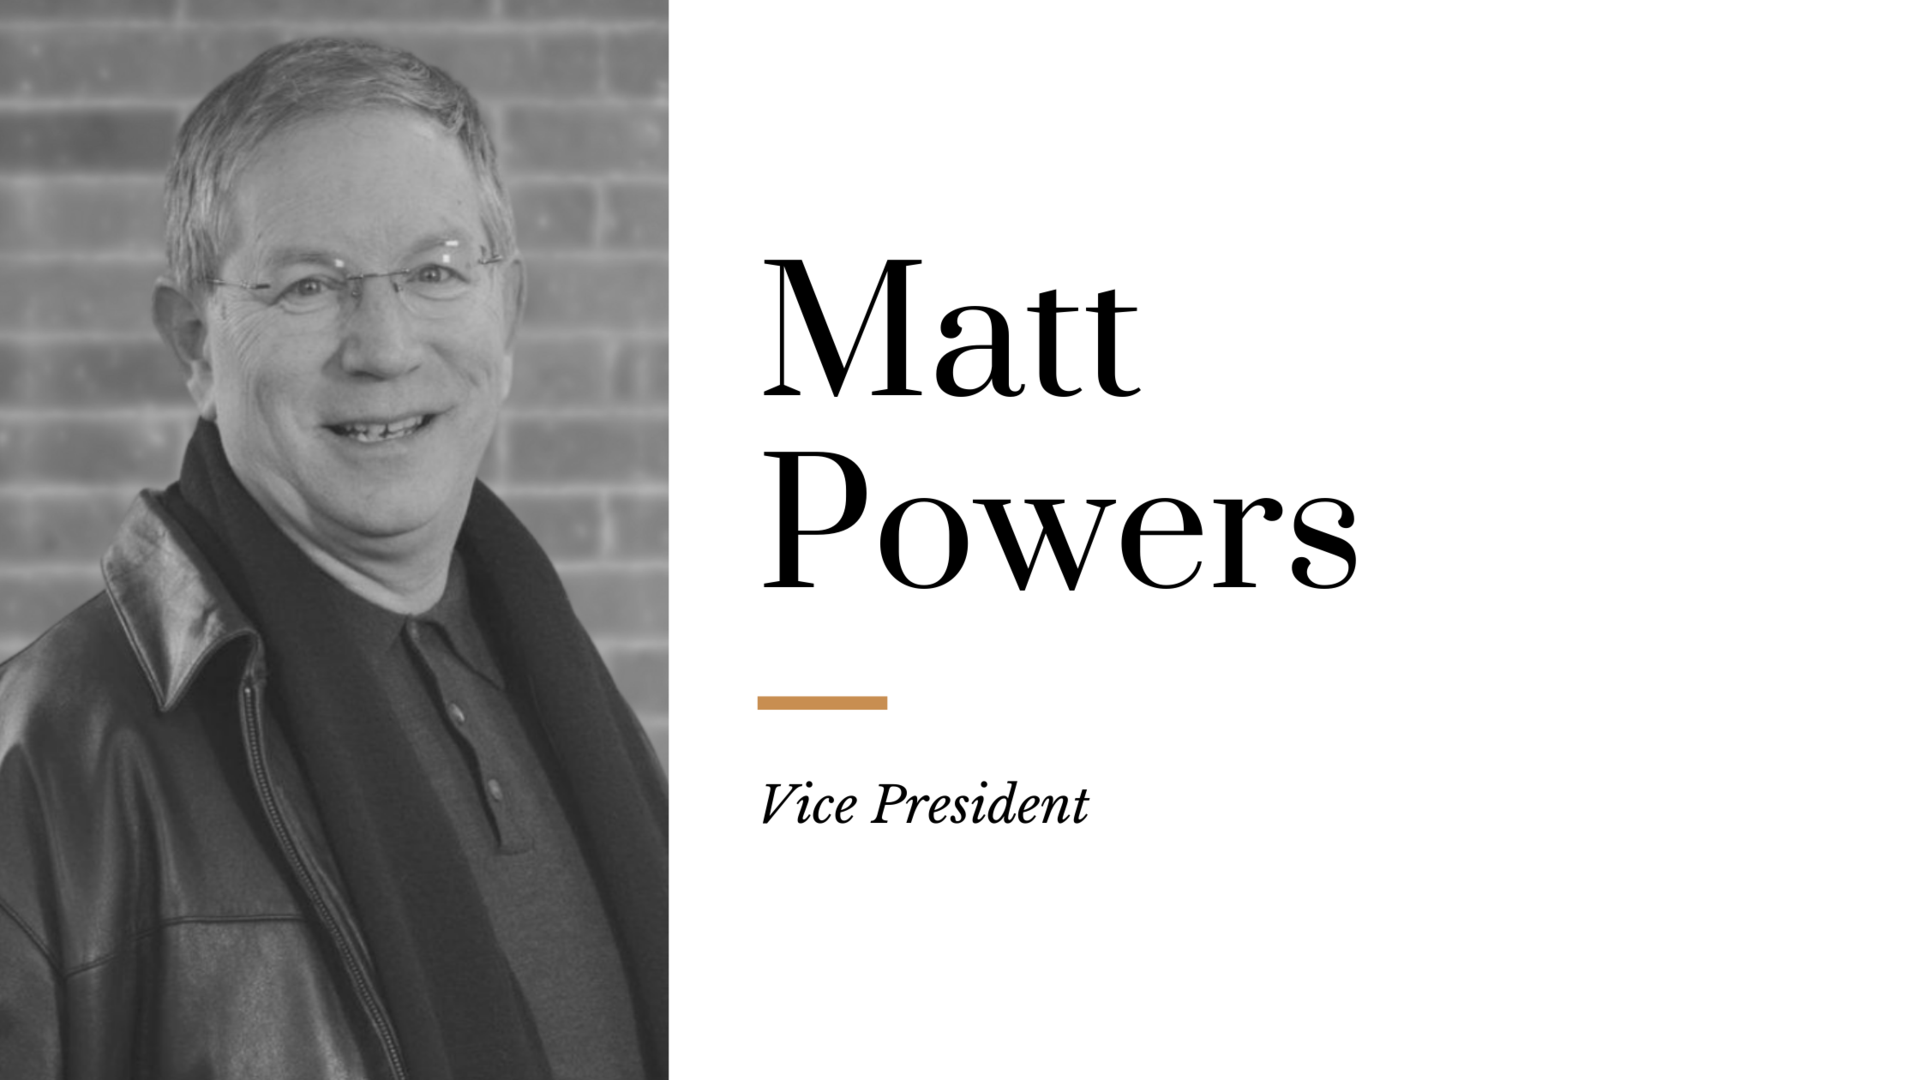 Matt Powers - Vice President